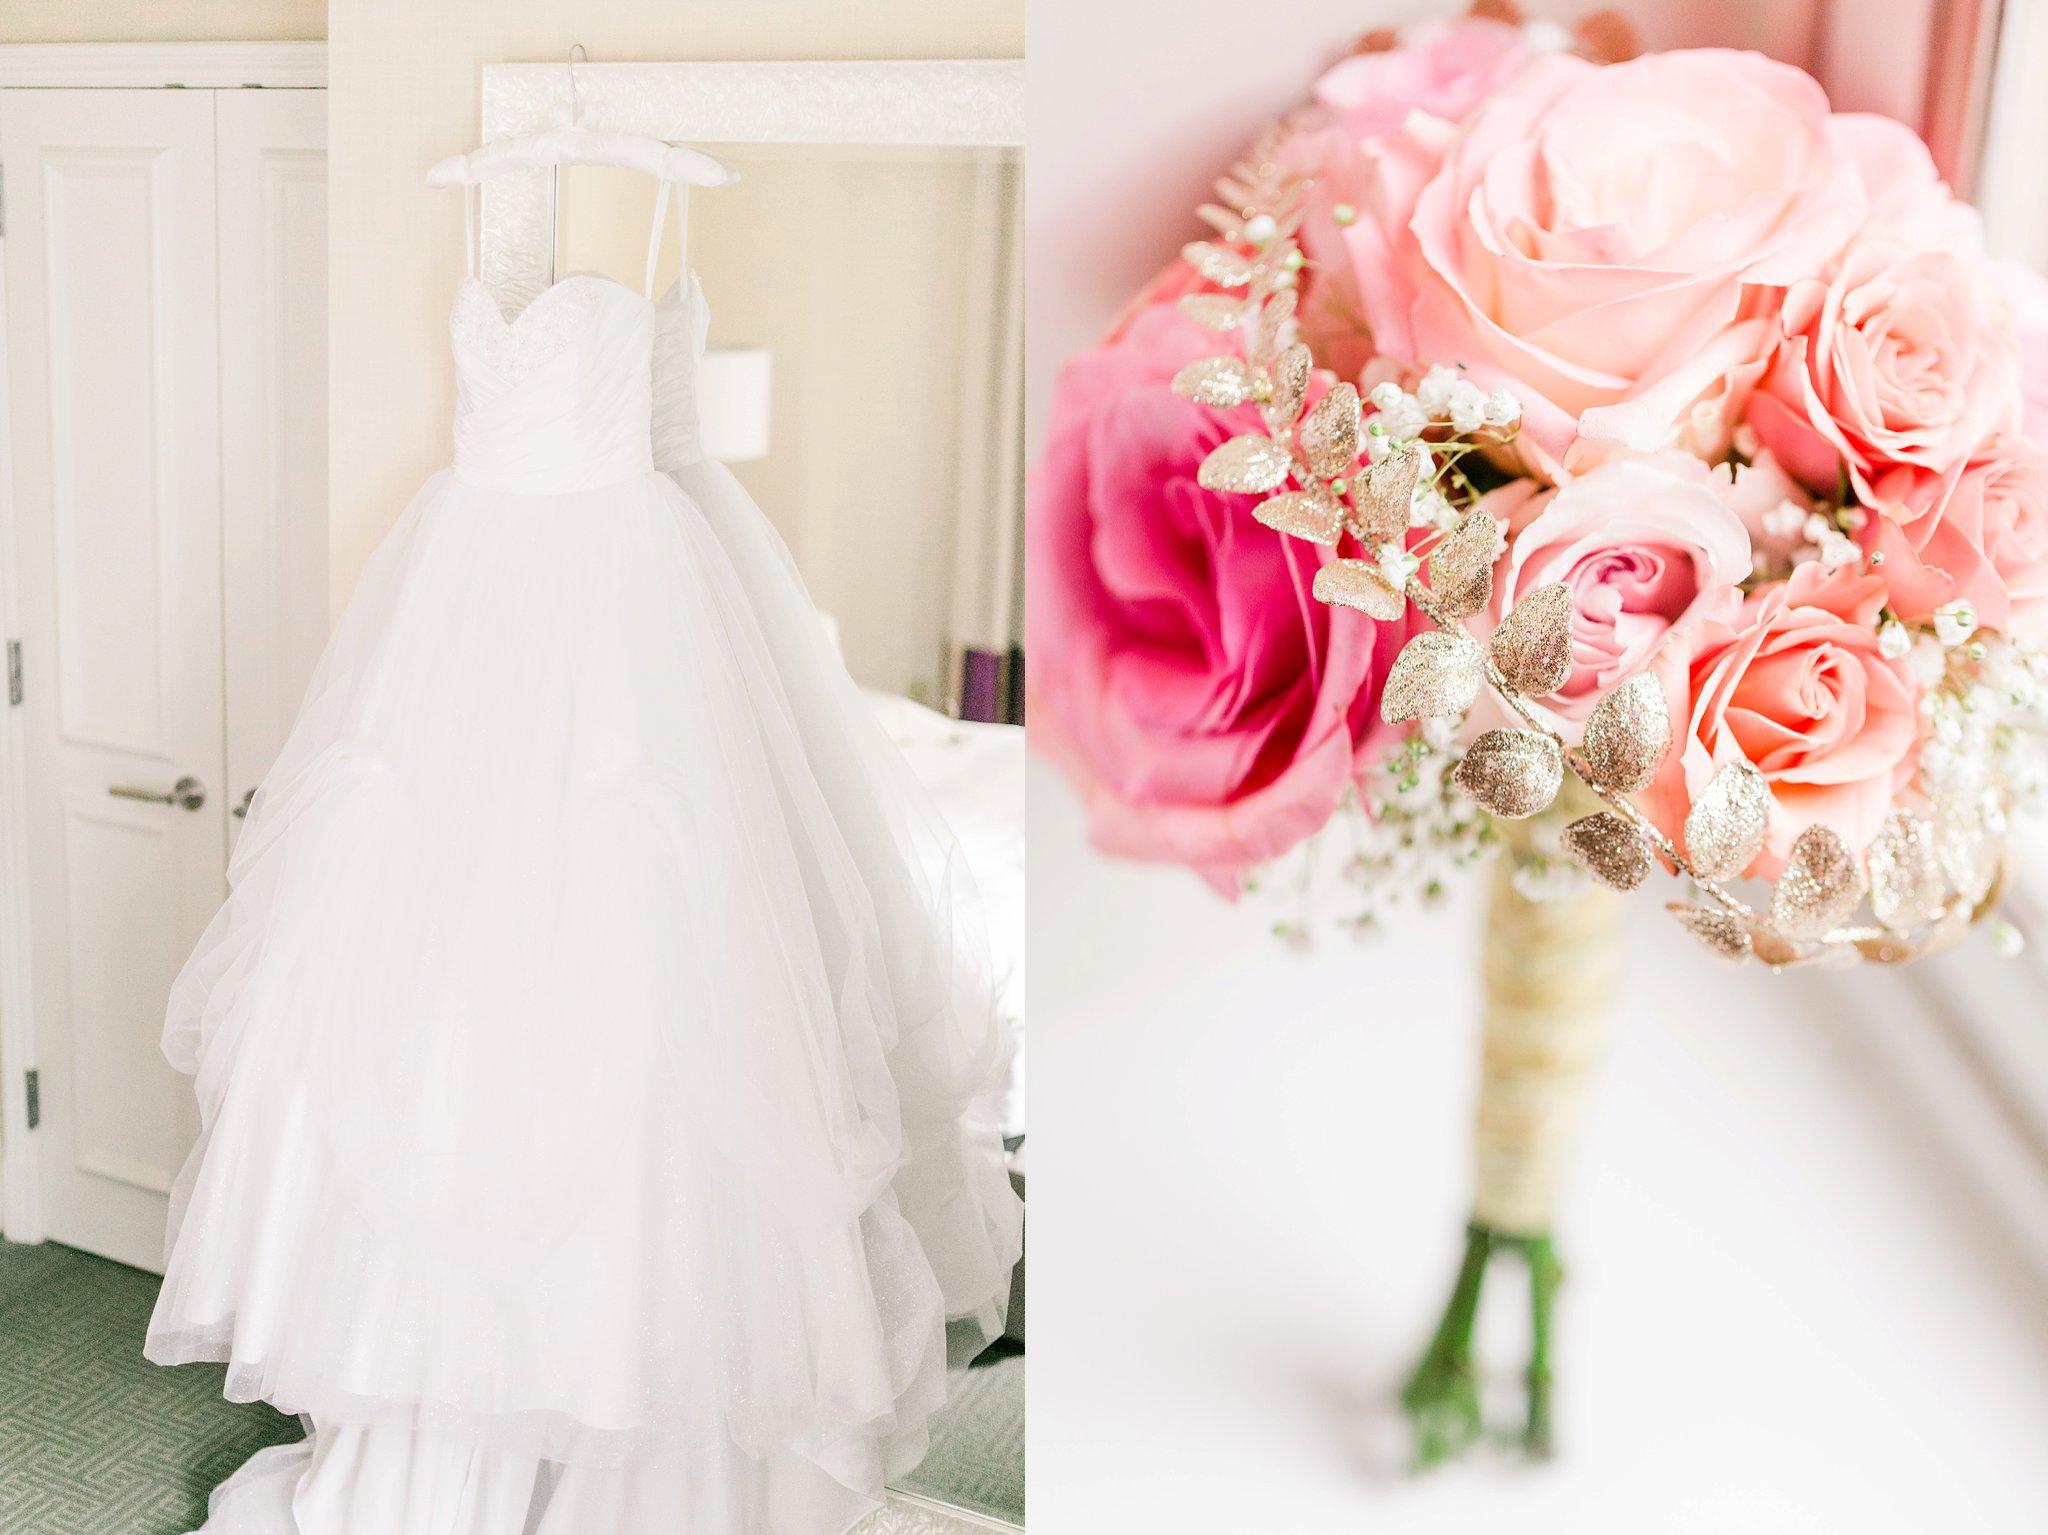 Mayflower Hotel Wedding Photos DC Pink & Gold Winter Wedding Tori & Tyler-17_photo.jpg